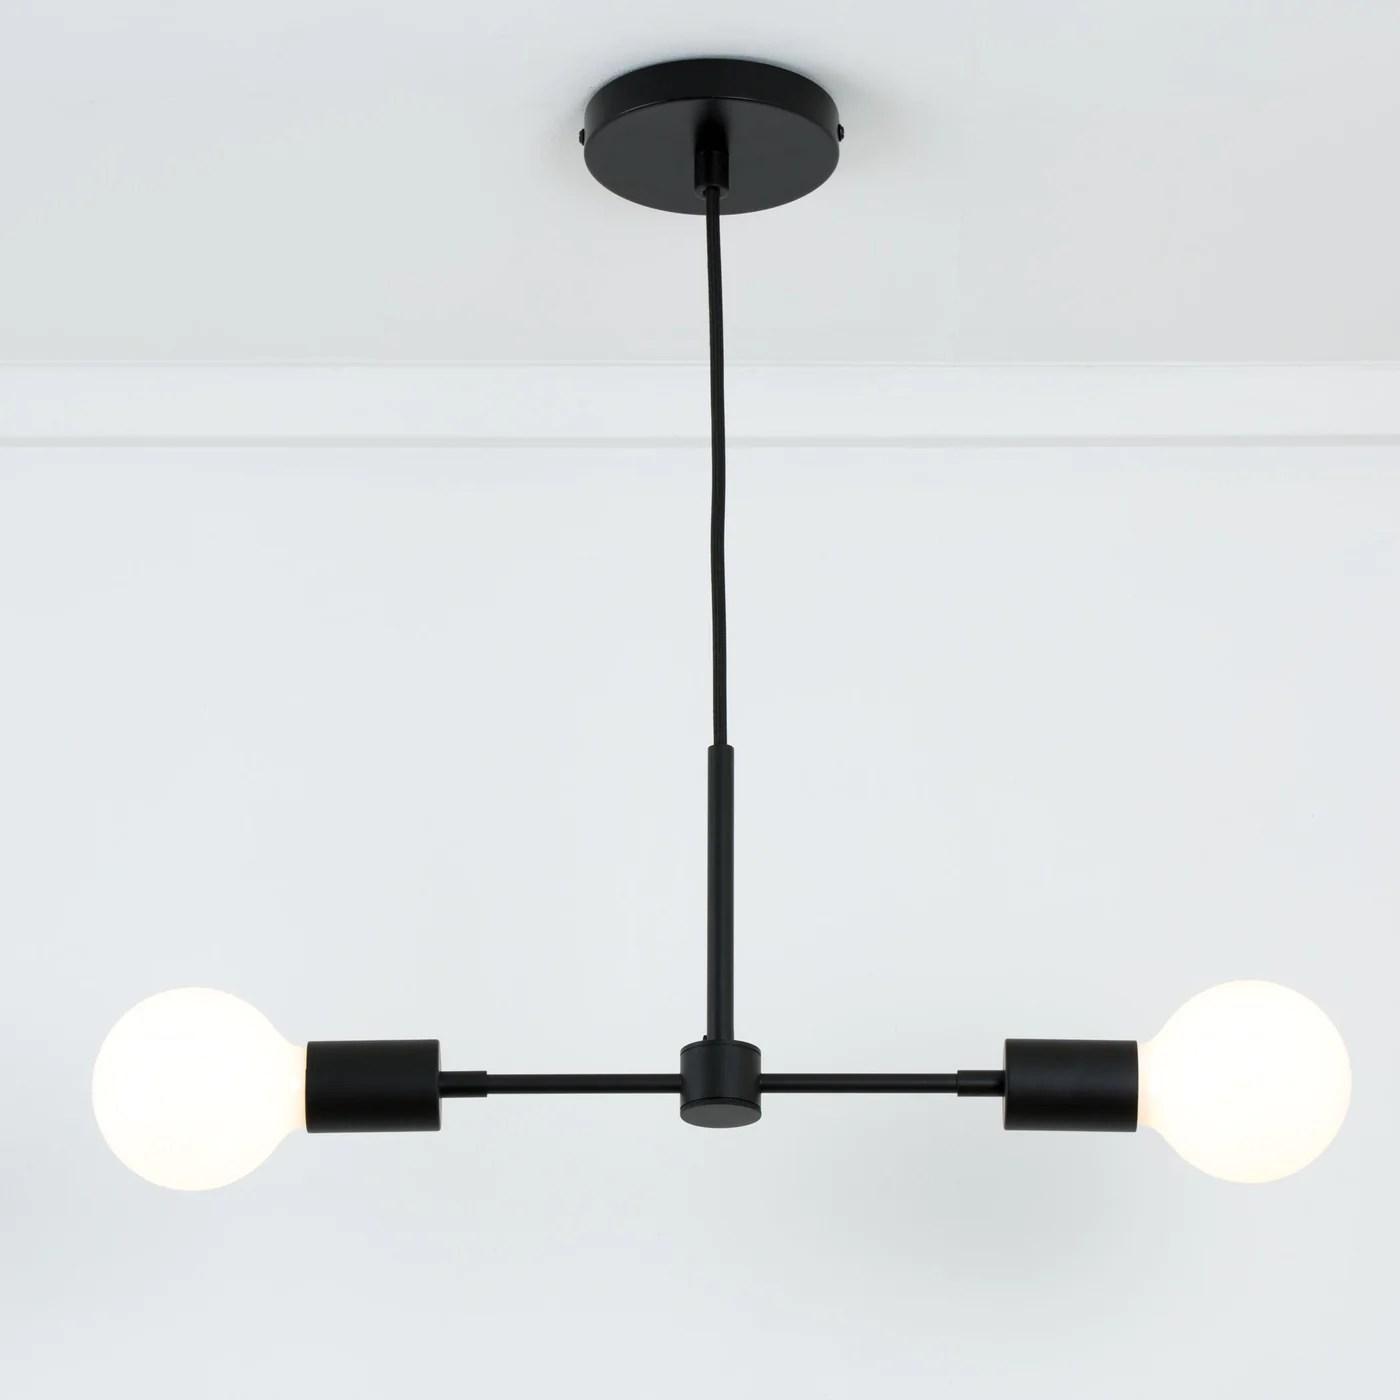 pendant light fixture google patents on wiring led light fixtures wiring diagram go [ 1400 x 1400 Pixel ]